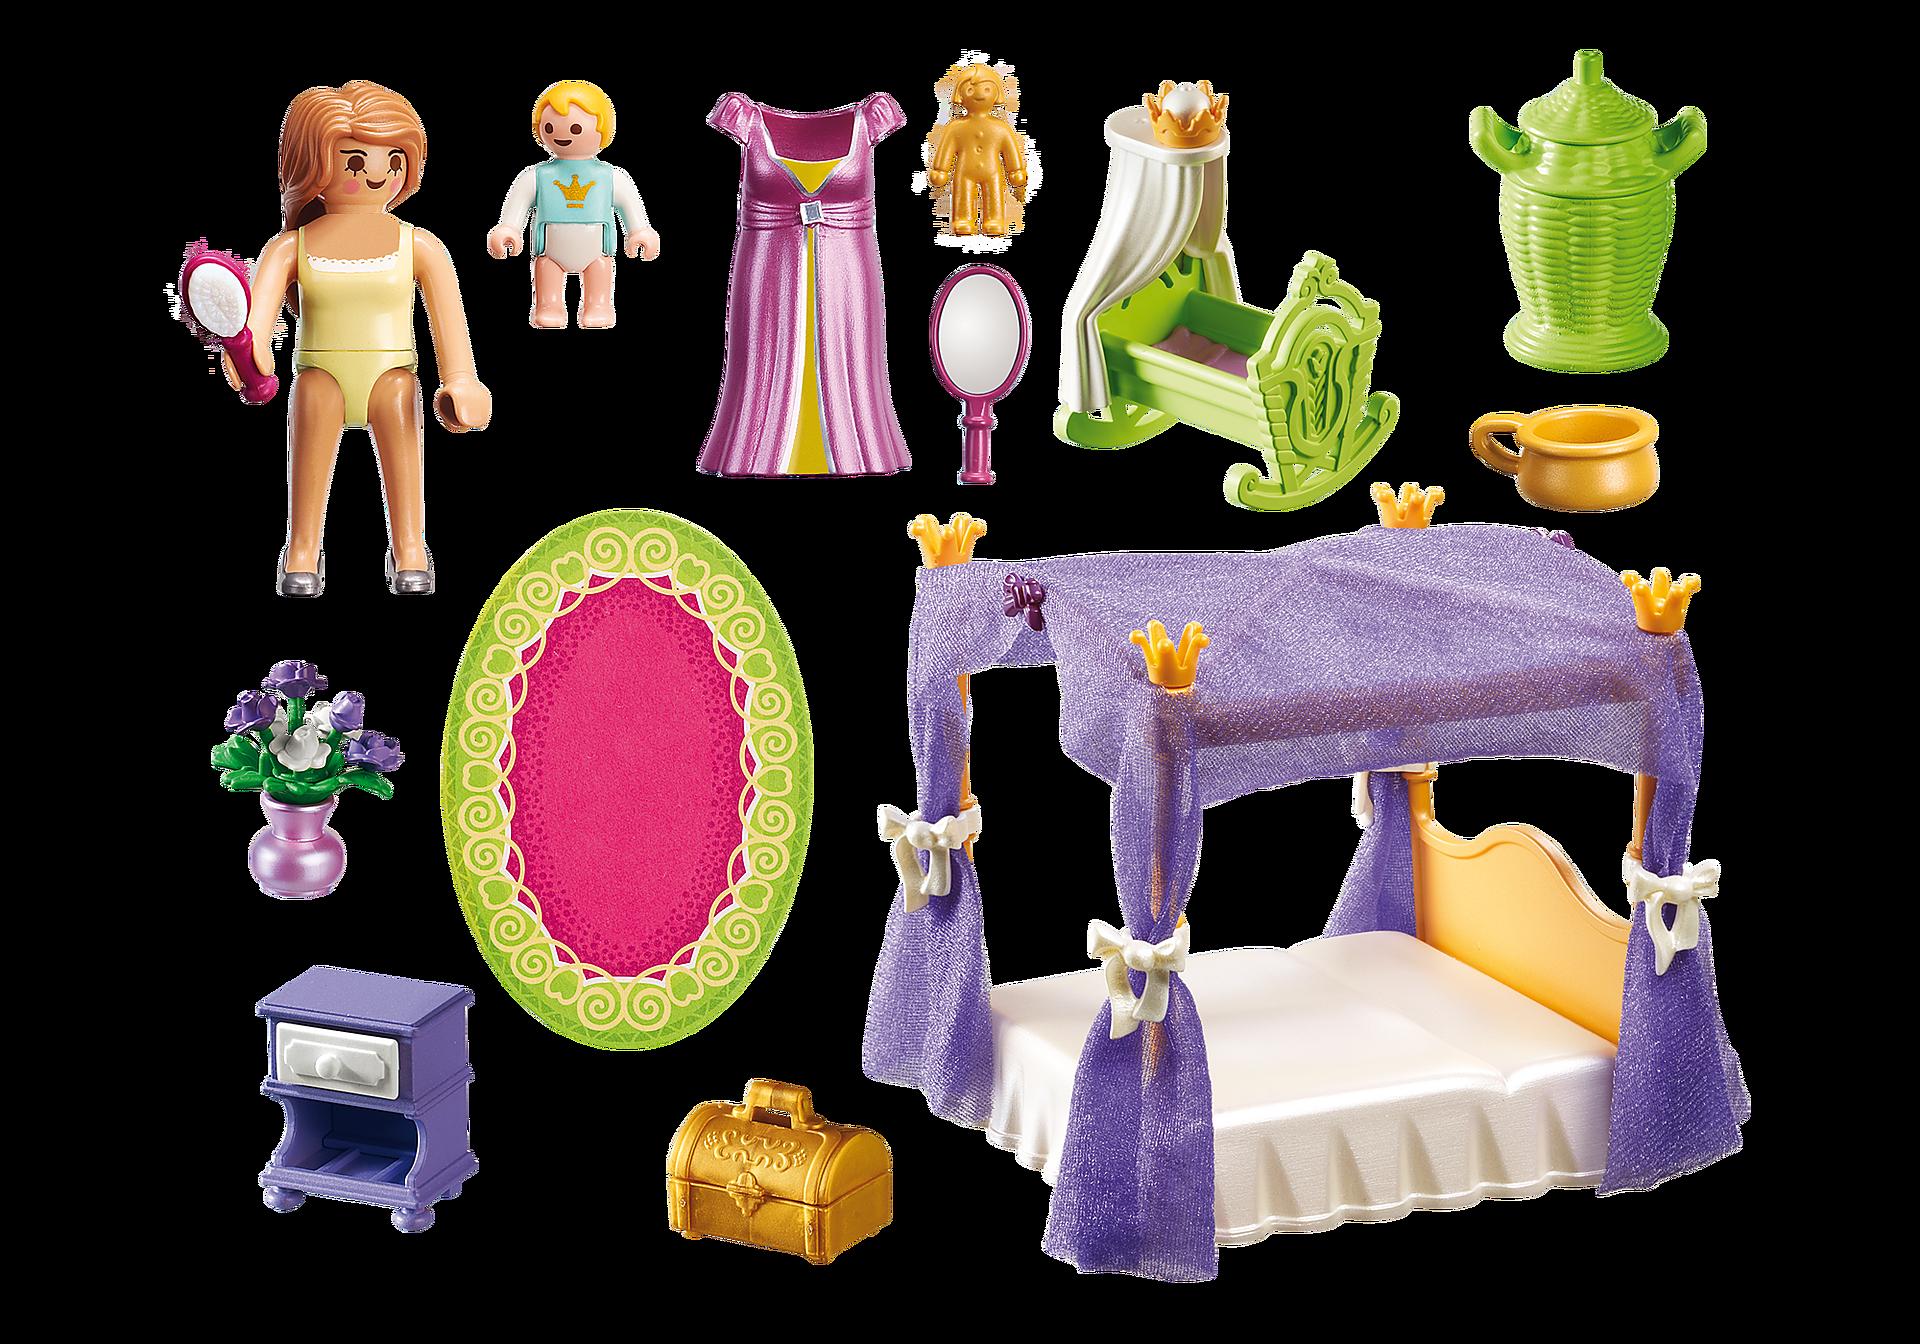 http://media.playmobil.com/i/playmobil/6851_product_box_back/Замок Принцессы: Покои Принцессы с колыбелью